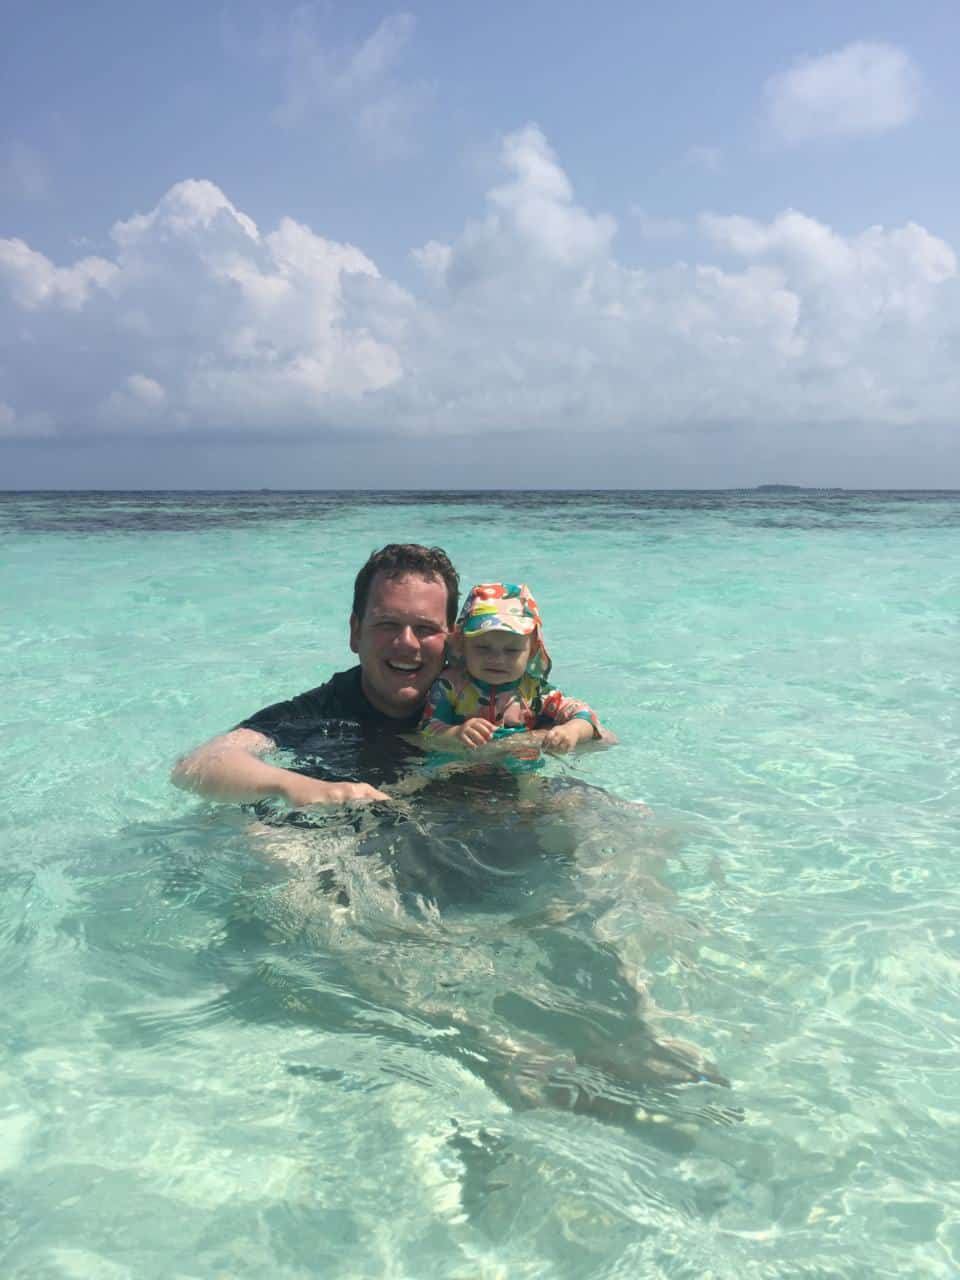 Maldives with baby, Maldives with a baby, Maldives with a toddler, Maldives with kids, Best Family Friendly Resorts Maldives